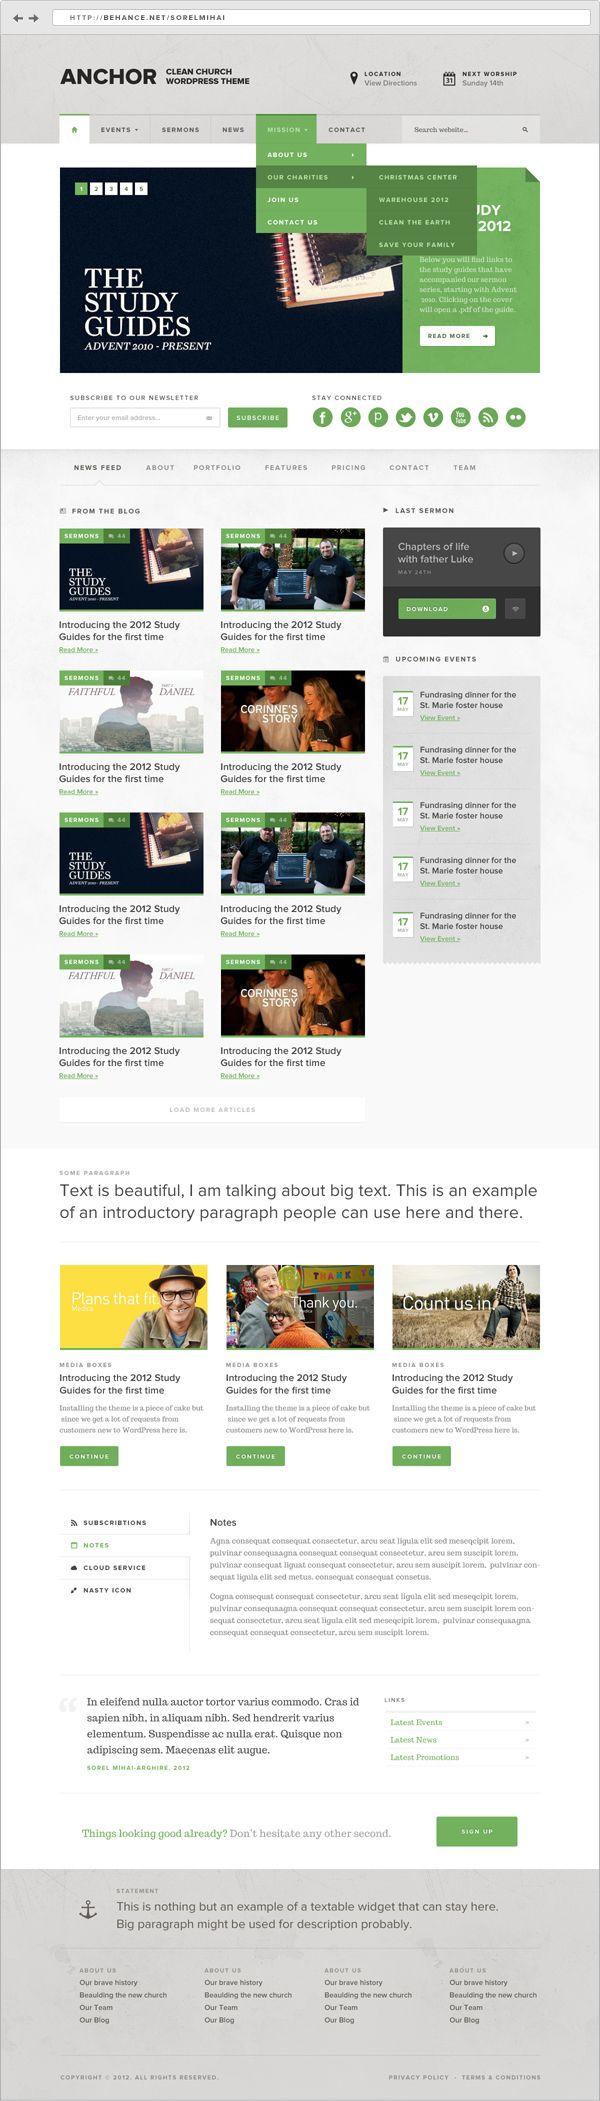 Anchor By Sorel Mihai Arghire Via Behance News Web Design Web Development Design Web Design Gallery